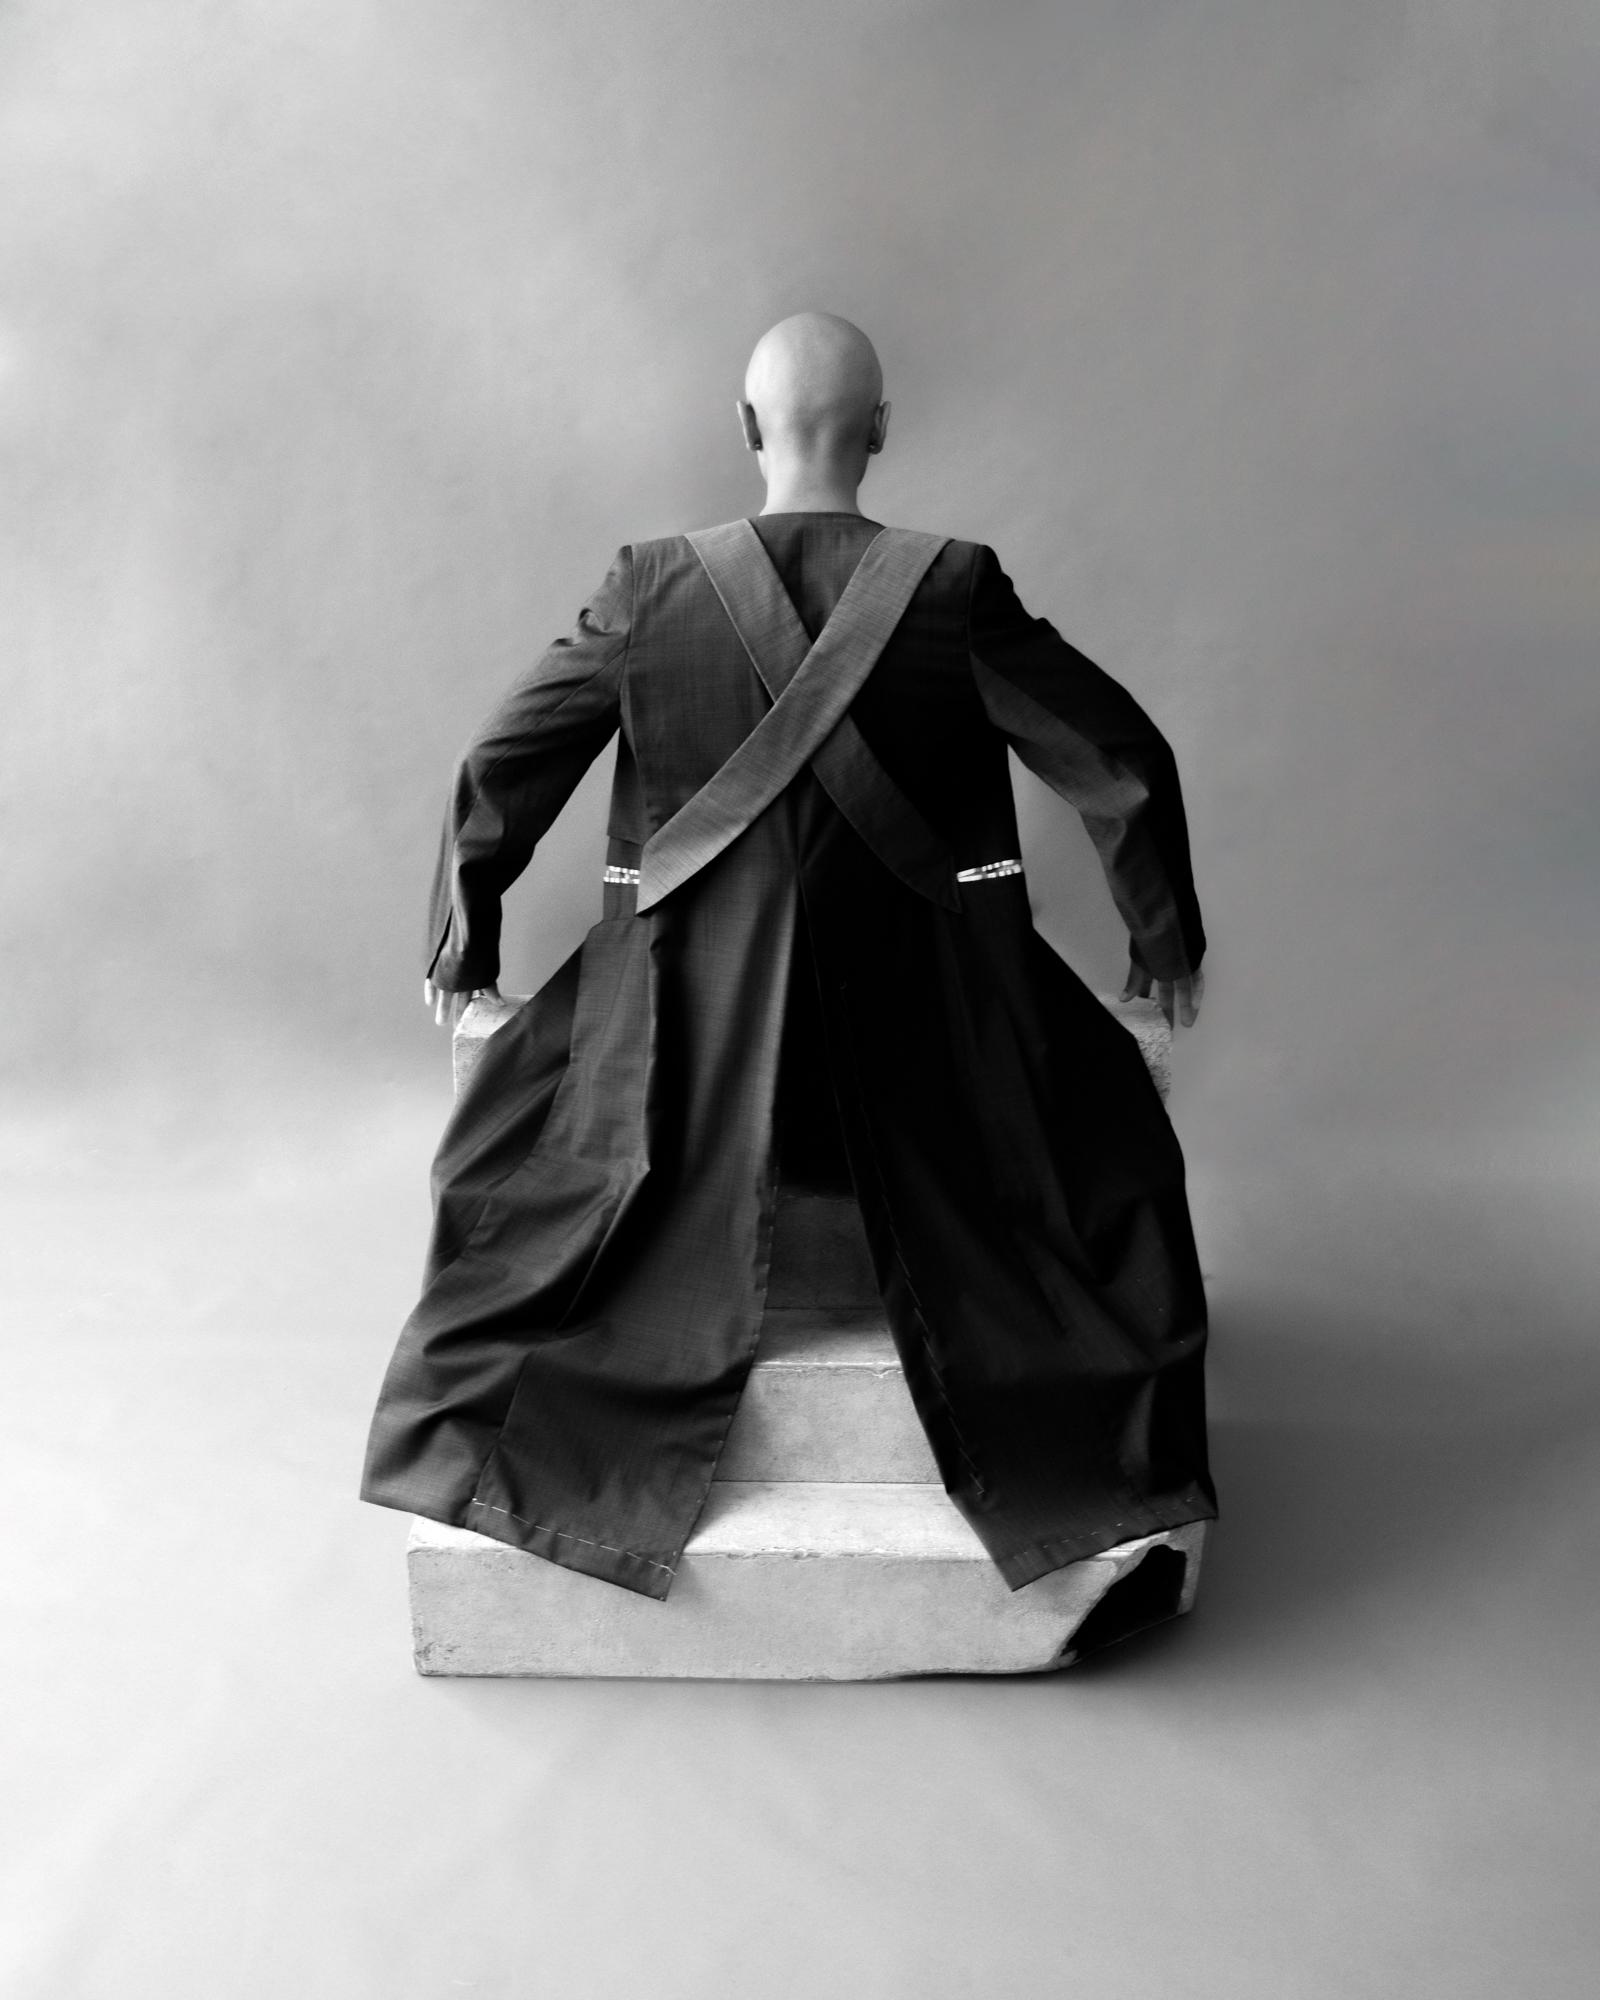 Black & white photograph, portrait, studio, body, man, fashion, NYC, USA